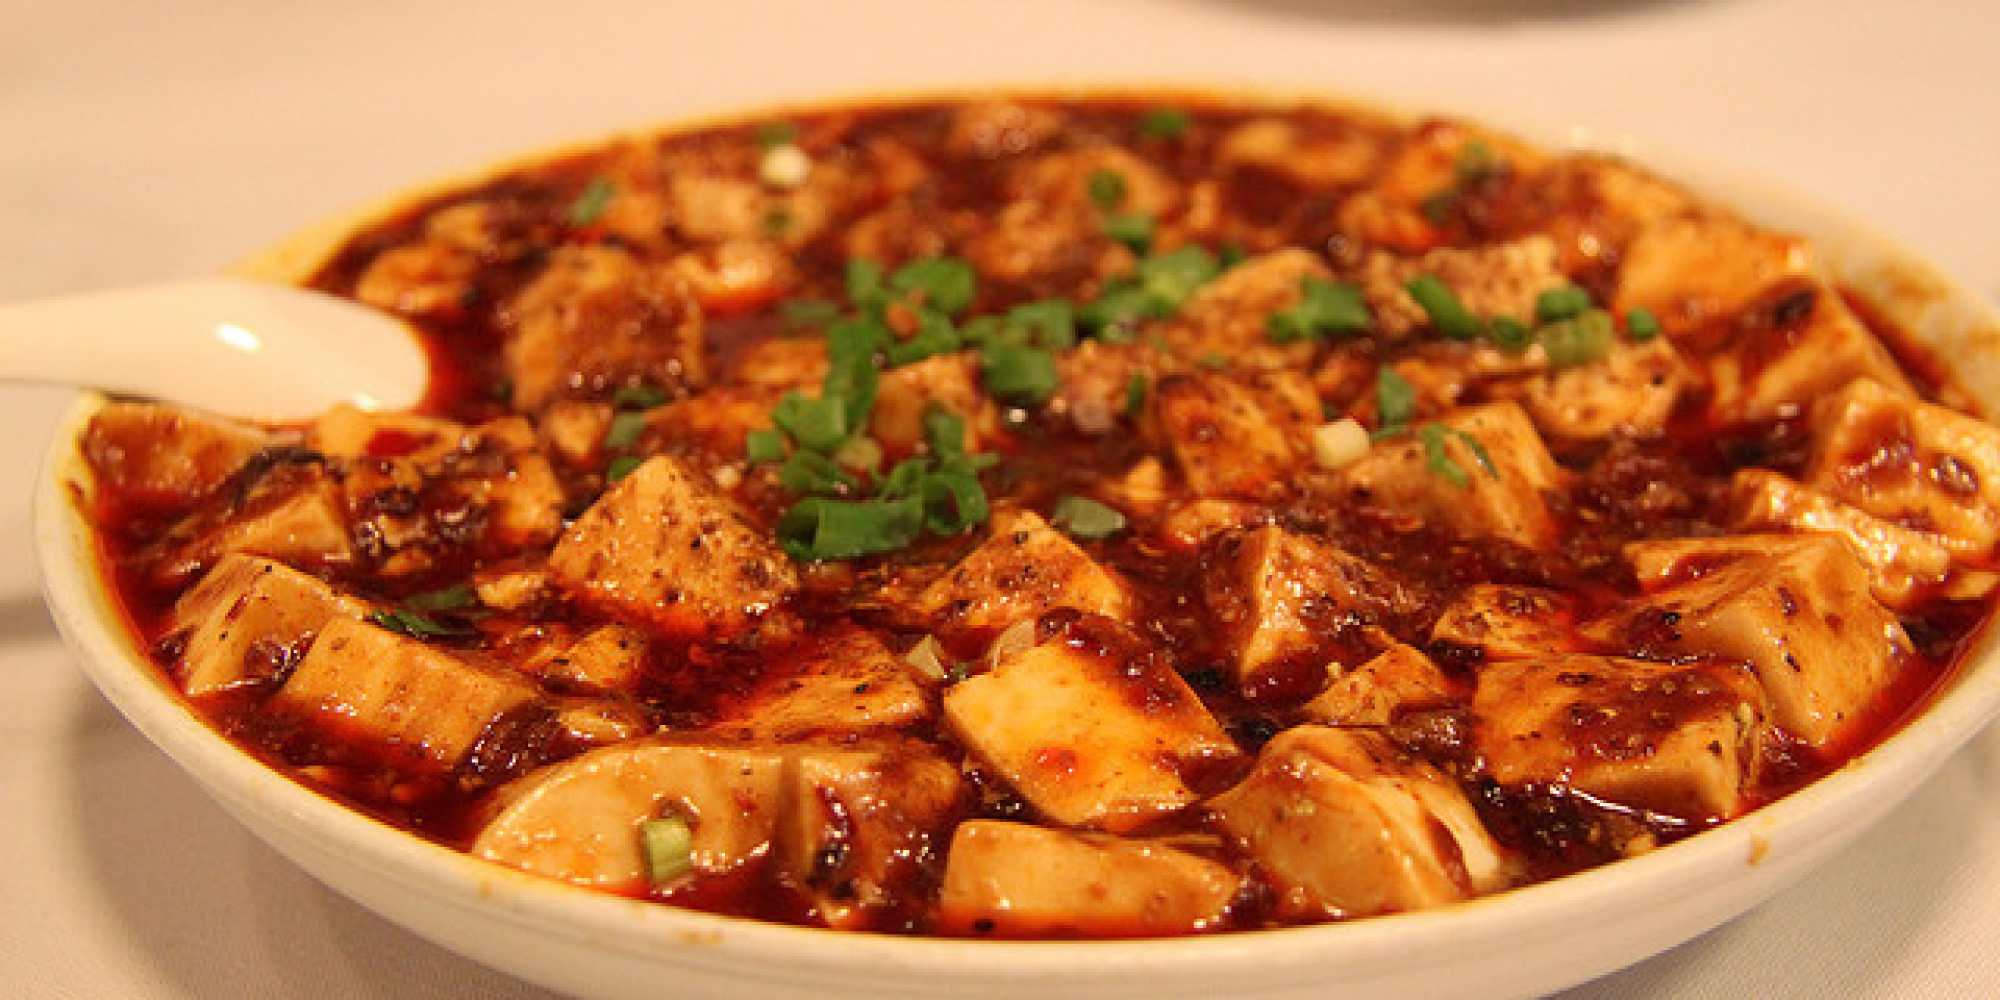 Best Ingredients For Sichuan Food